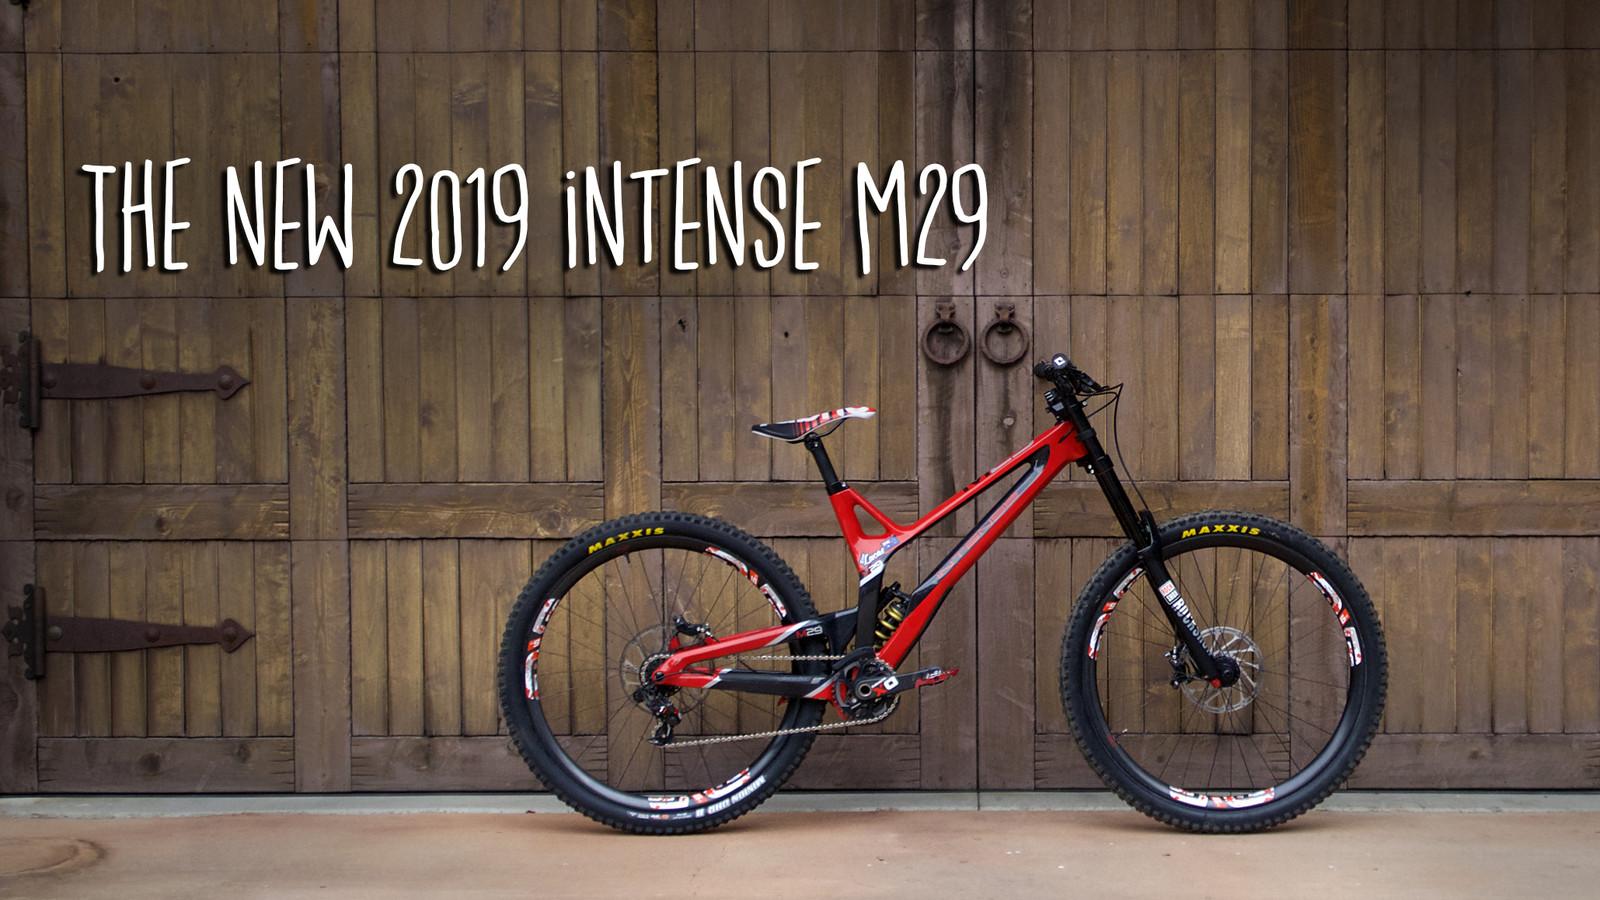 The New 2019 Intense M29 Carbon Downhill Bike